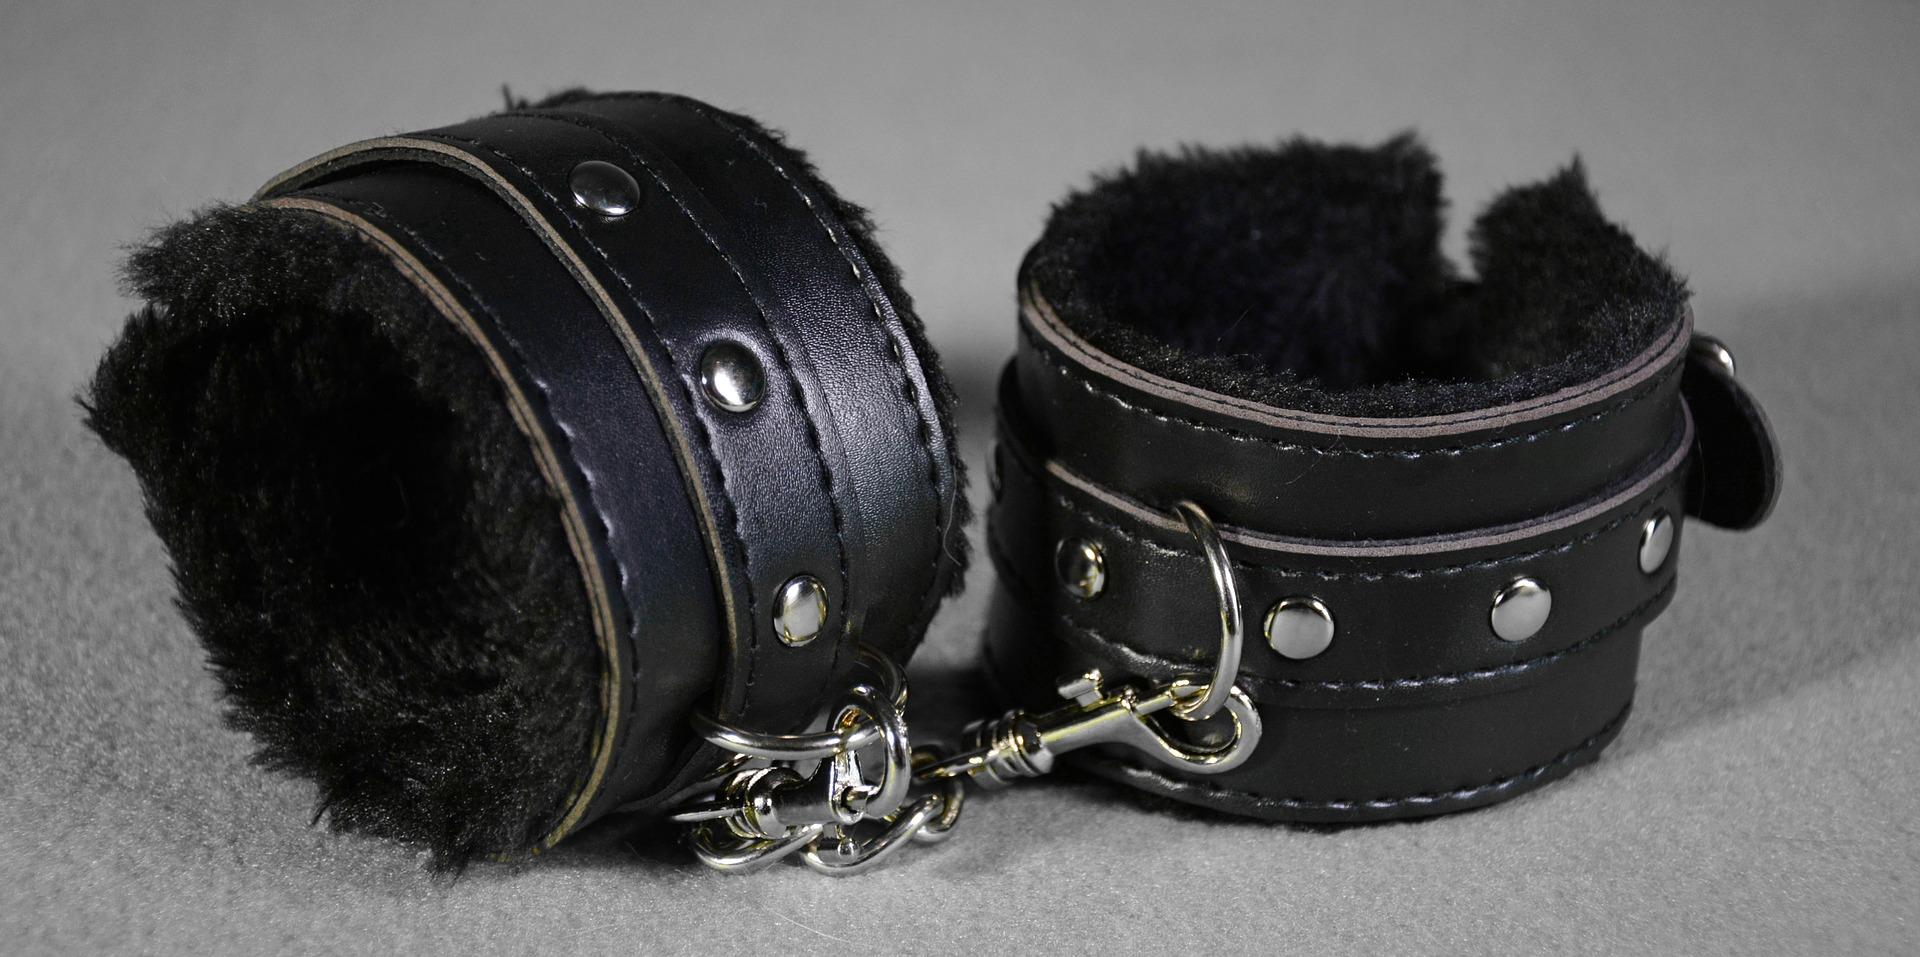 handcuffs-2726660_1920.jpg